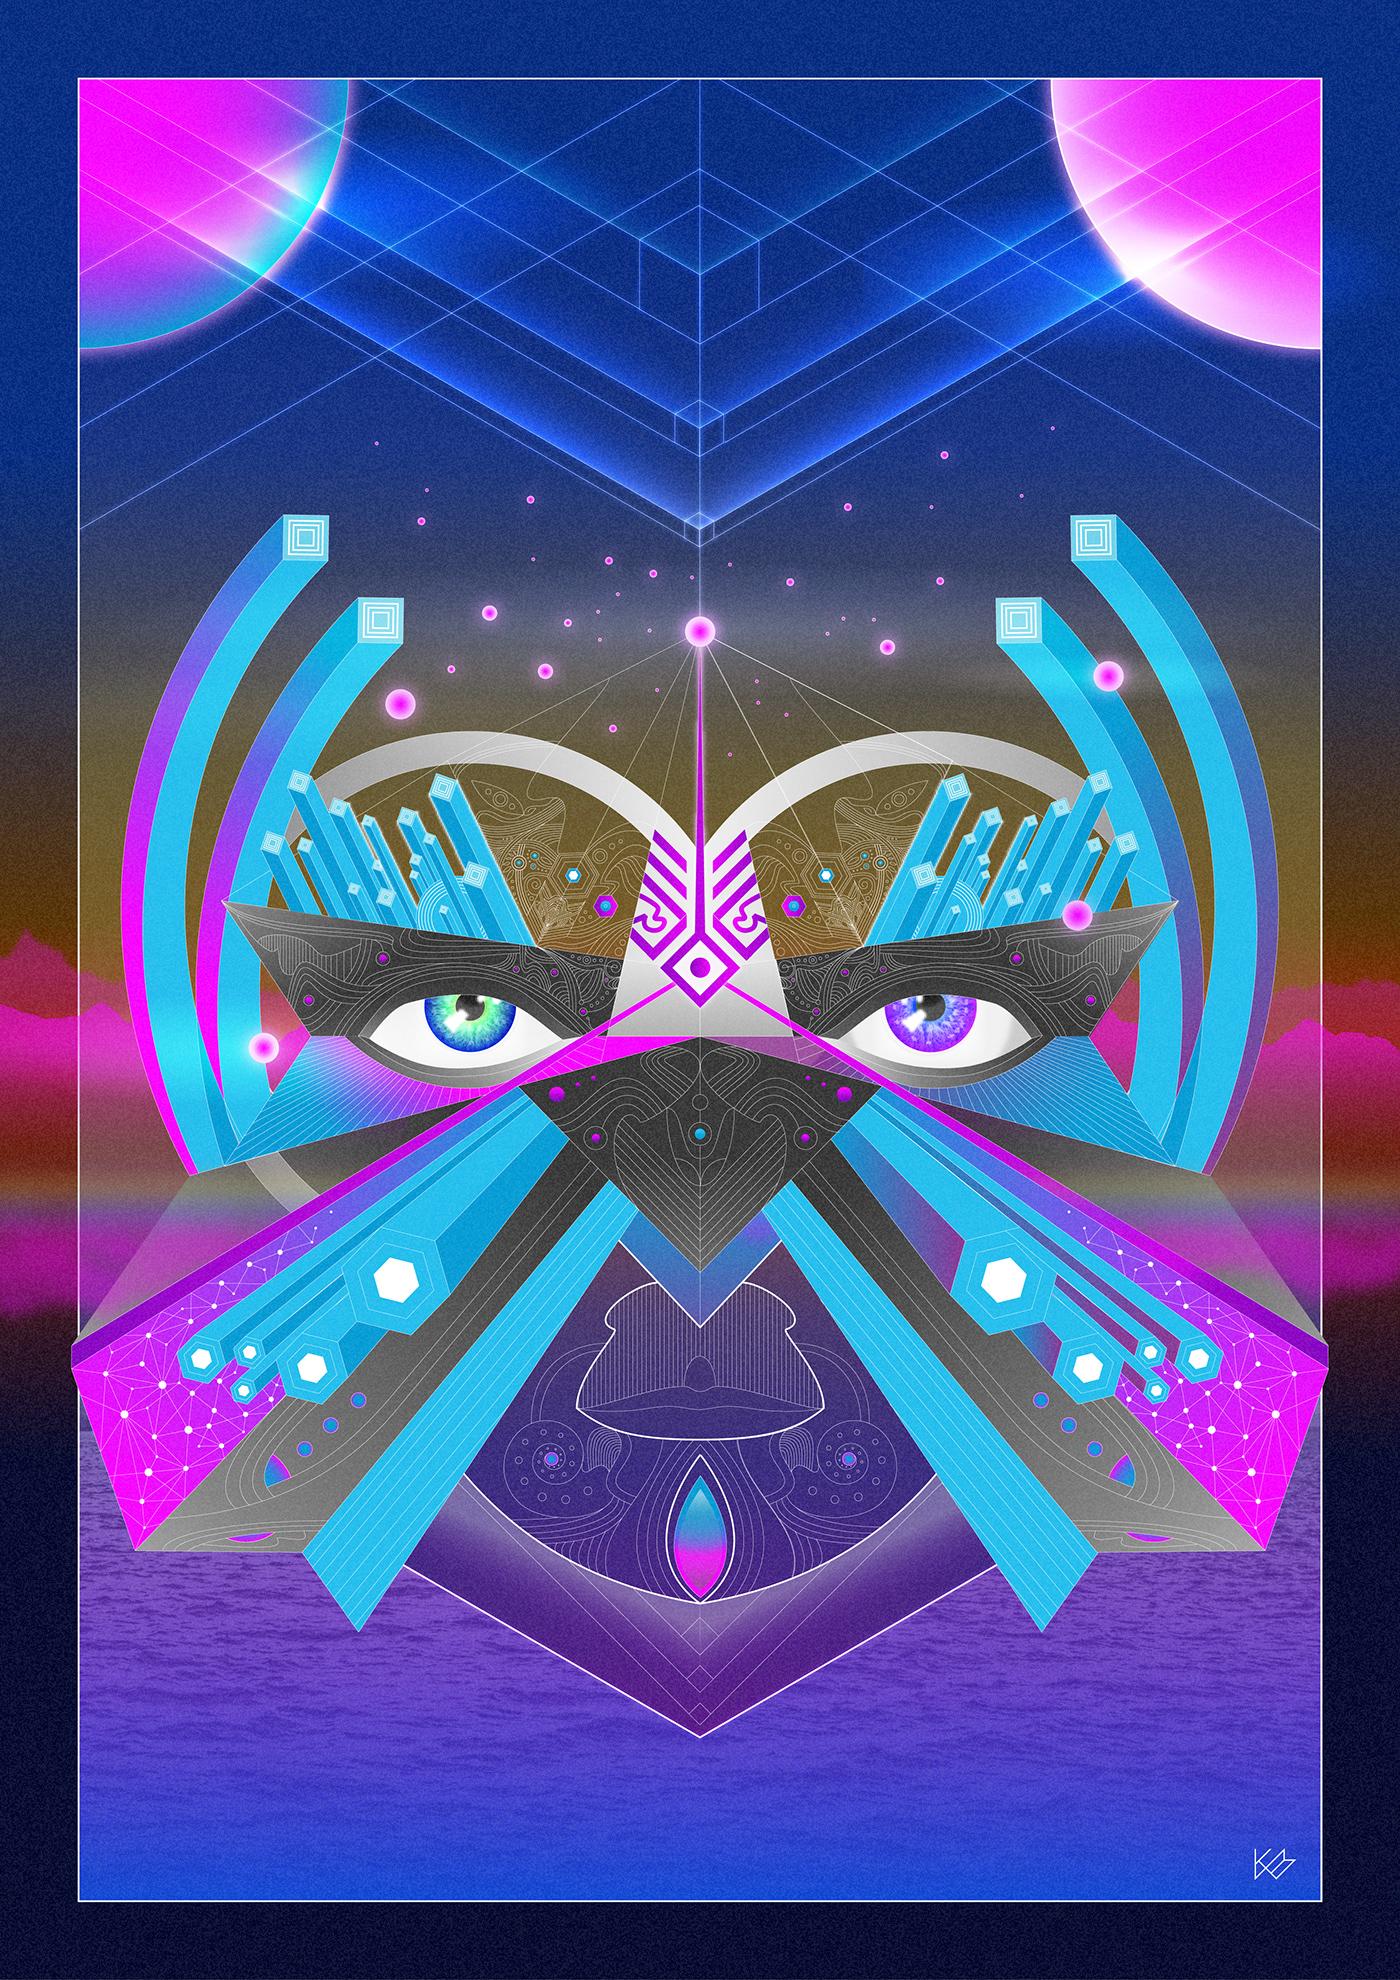 surrealism neon fantasy psychedelic dream patternwork 80's science fiction Digital Art  imagination